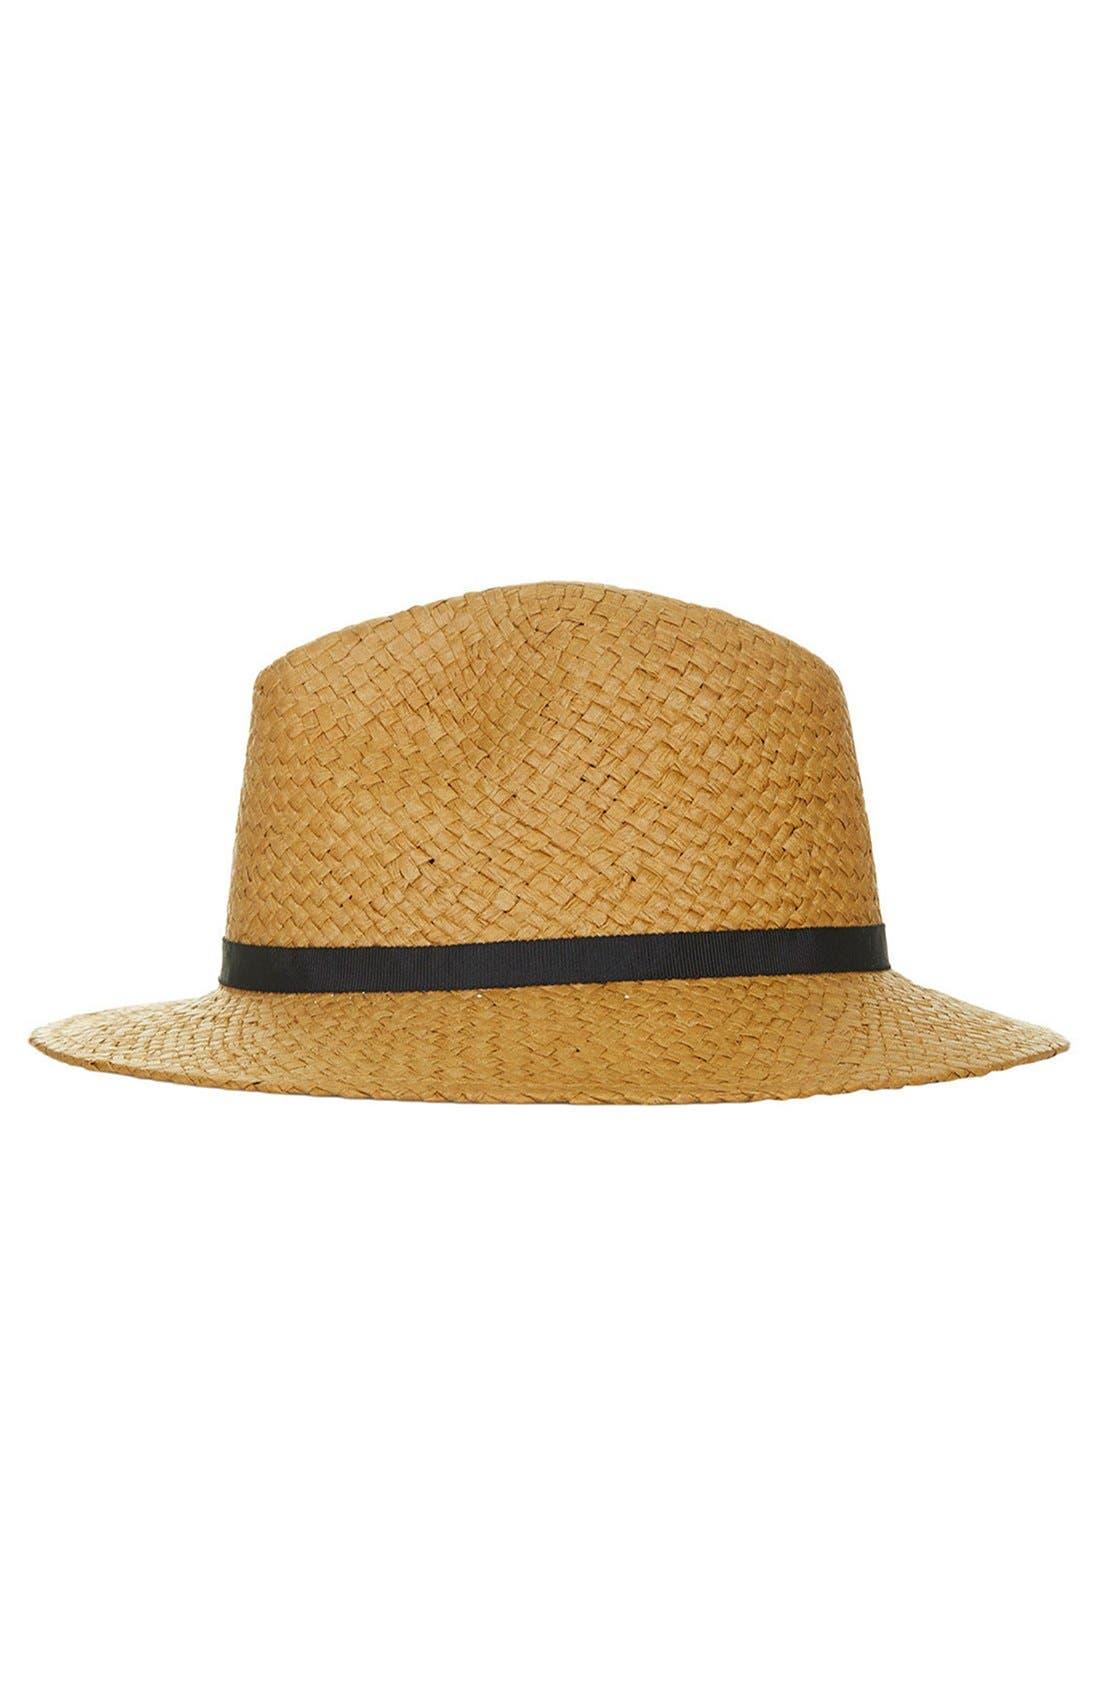 Main Image - Topshop Floppy Straw Hat